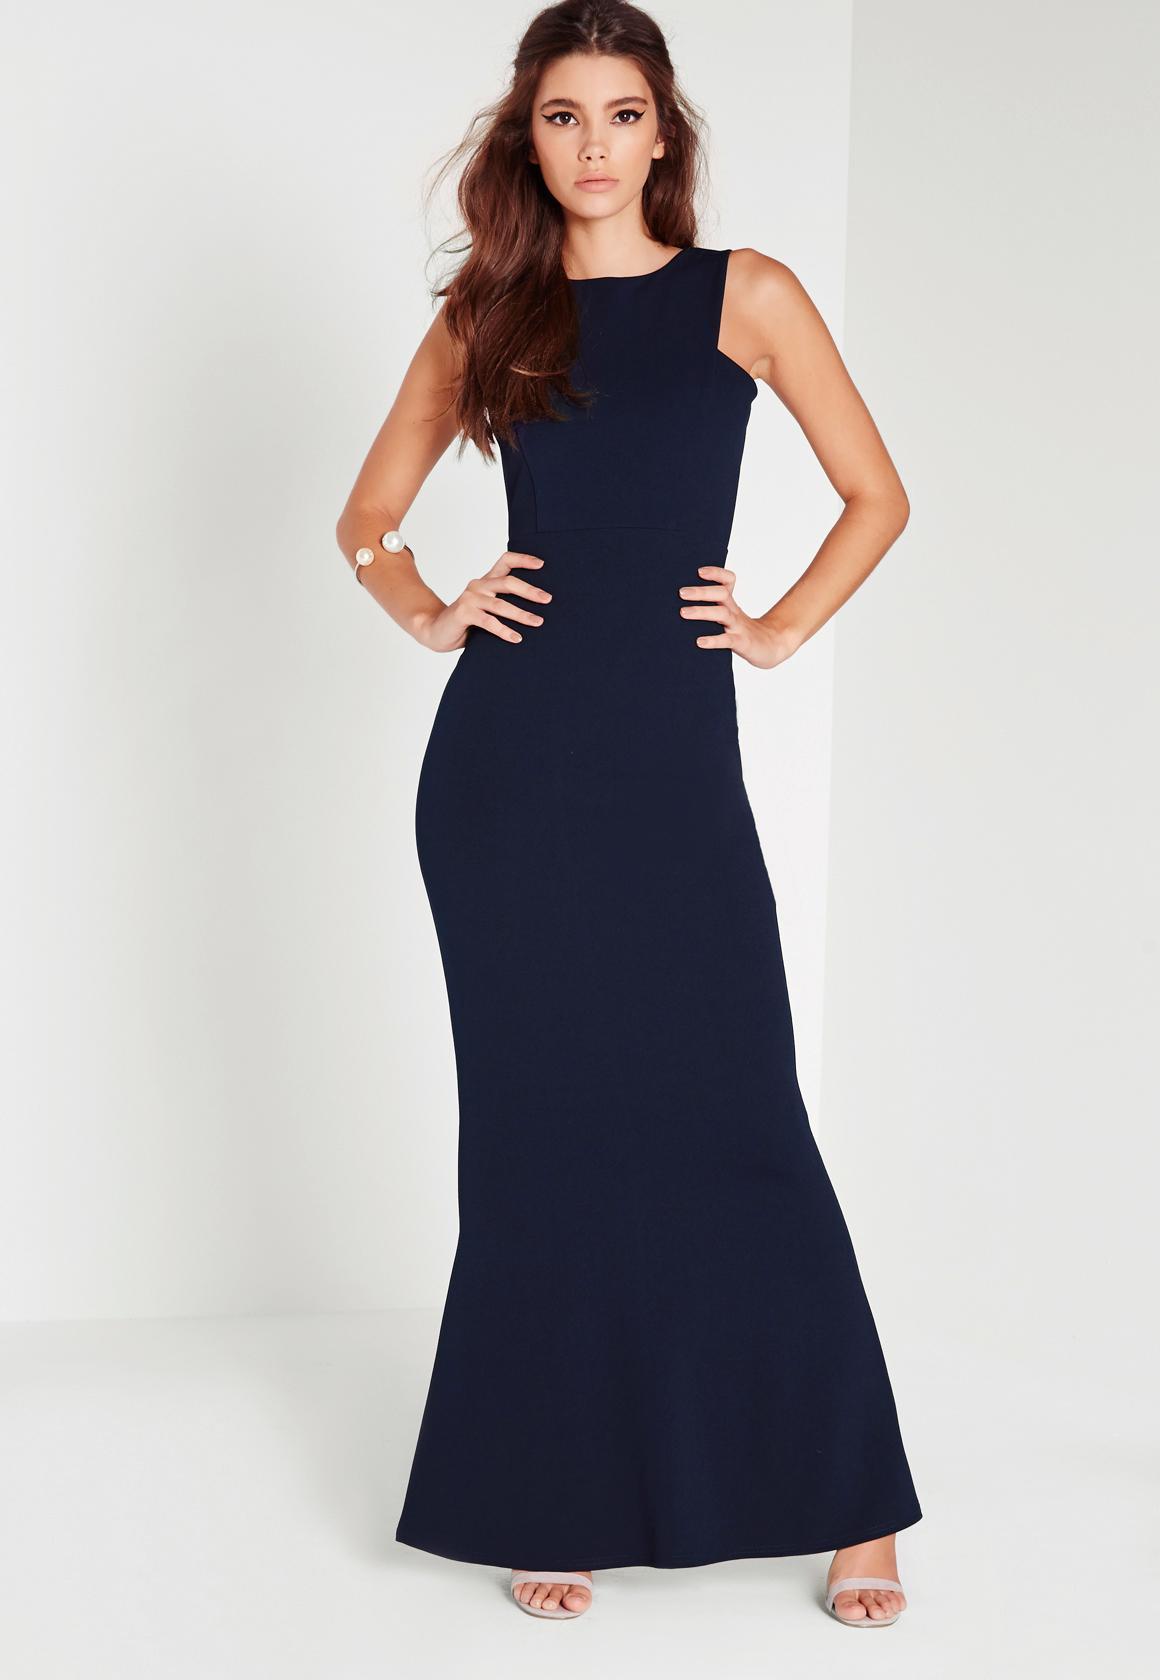 Longue robe bleu marine